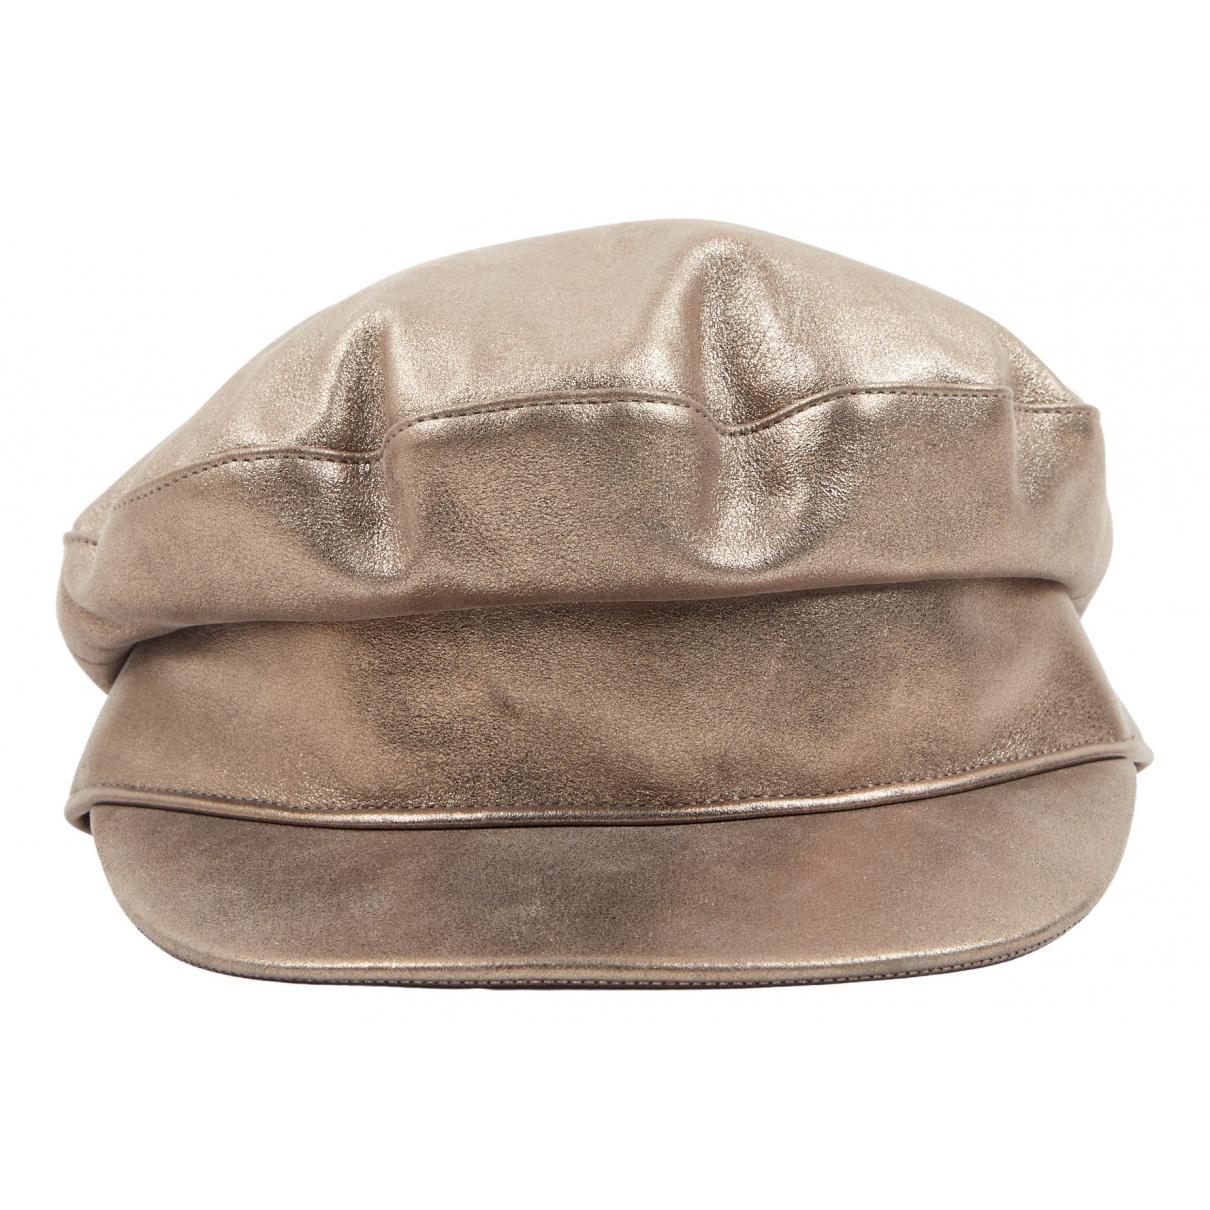 Hermès N Gold Leather hat for Women 56 cm